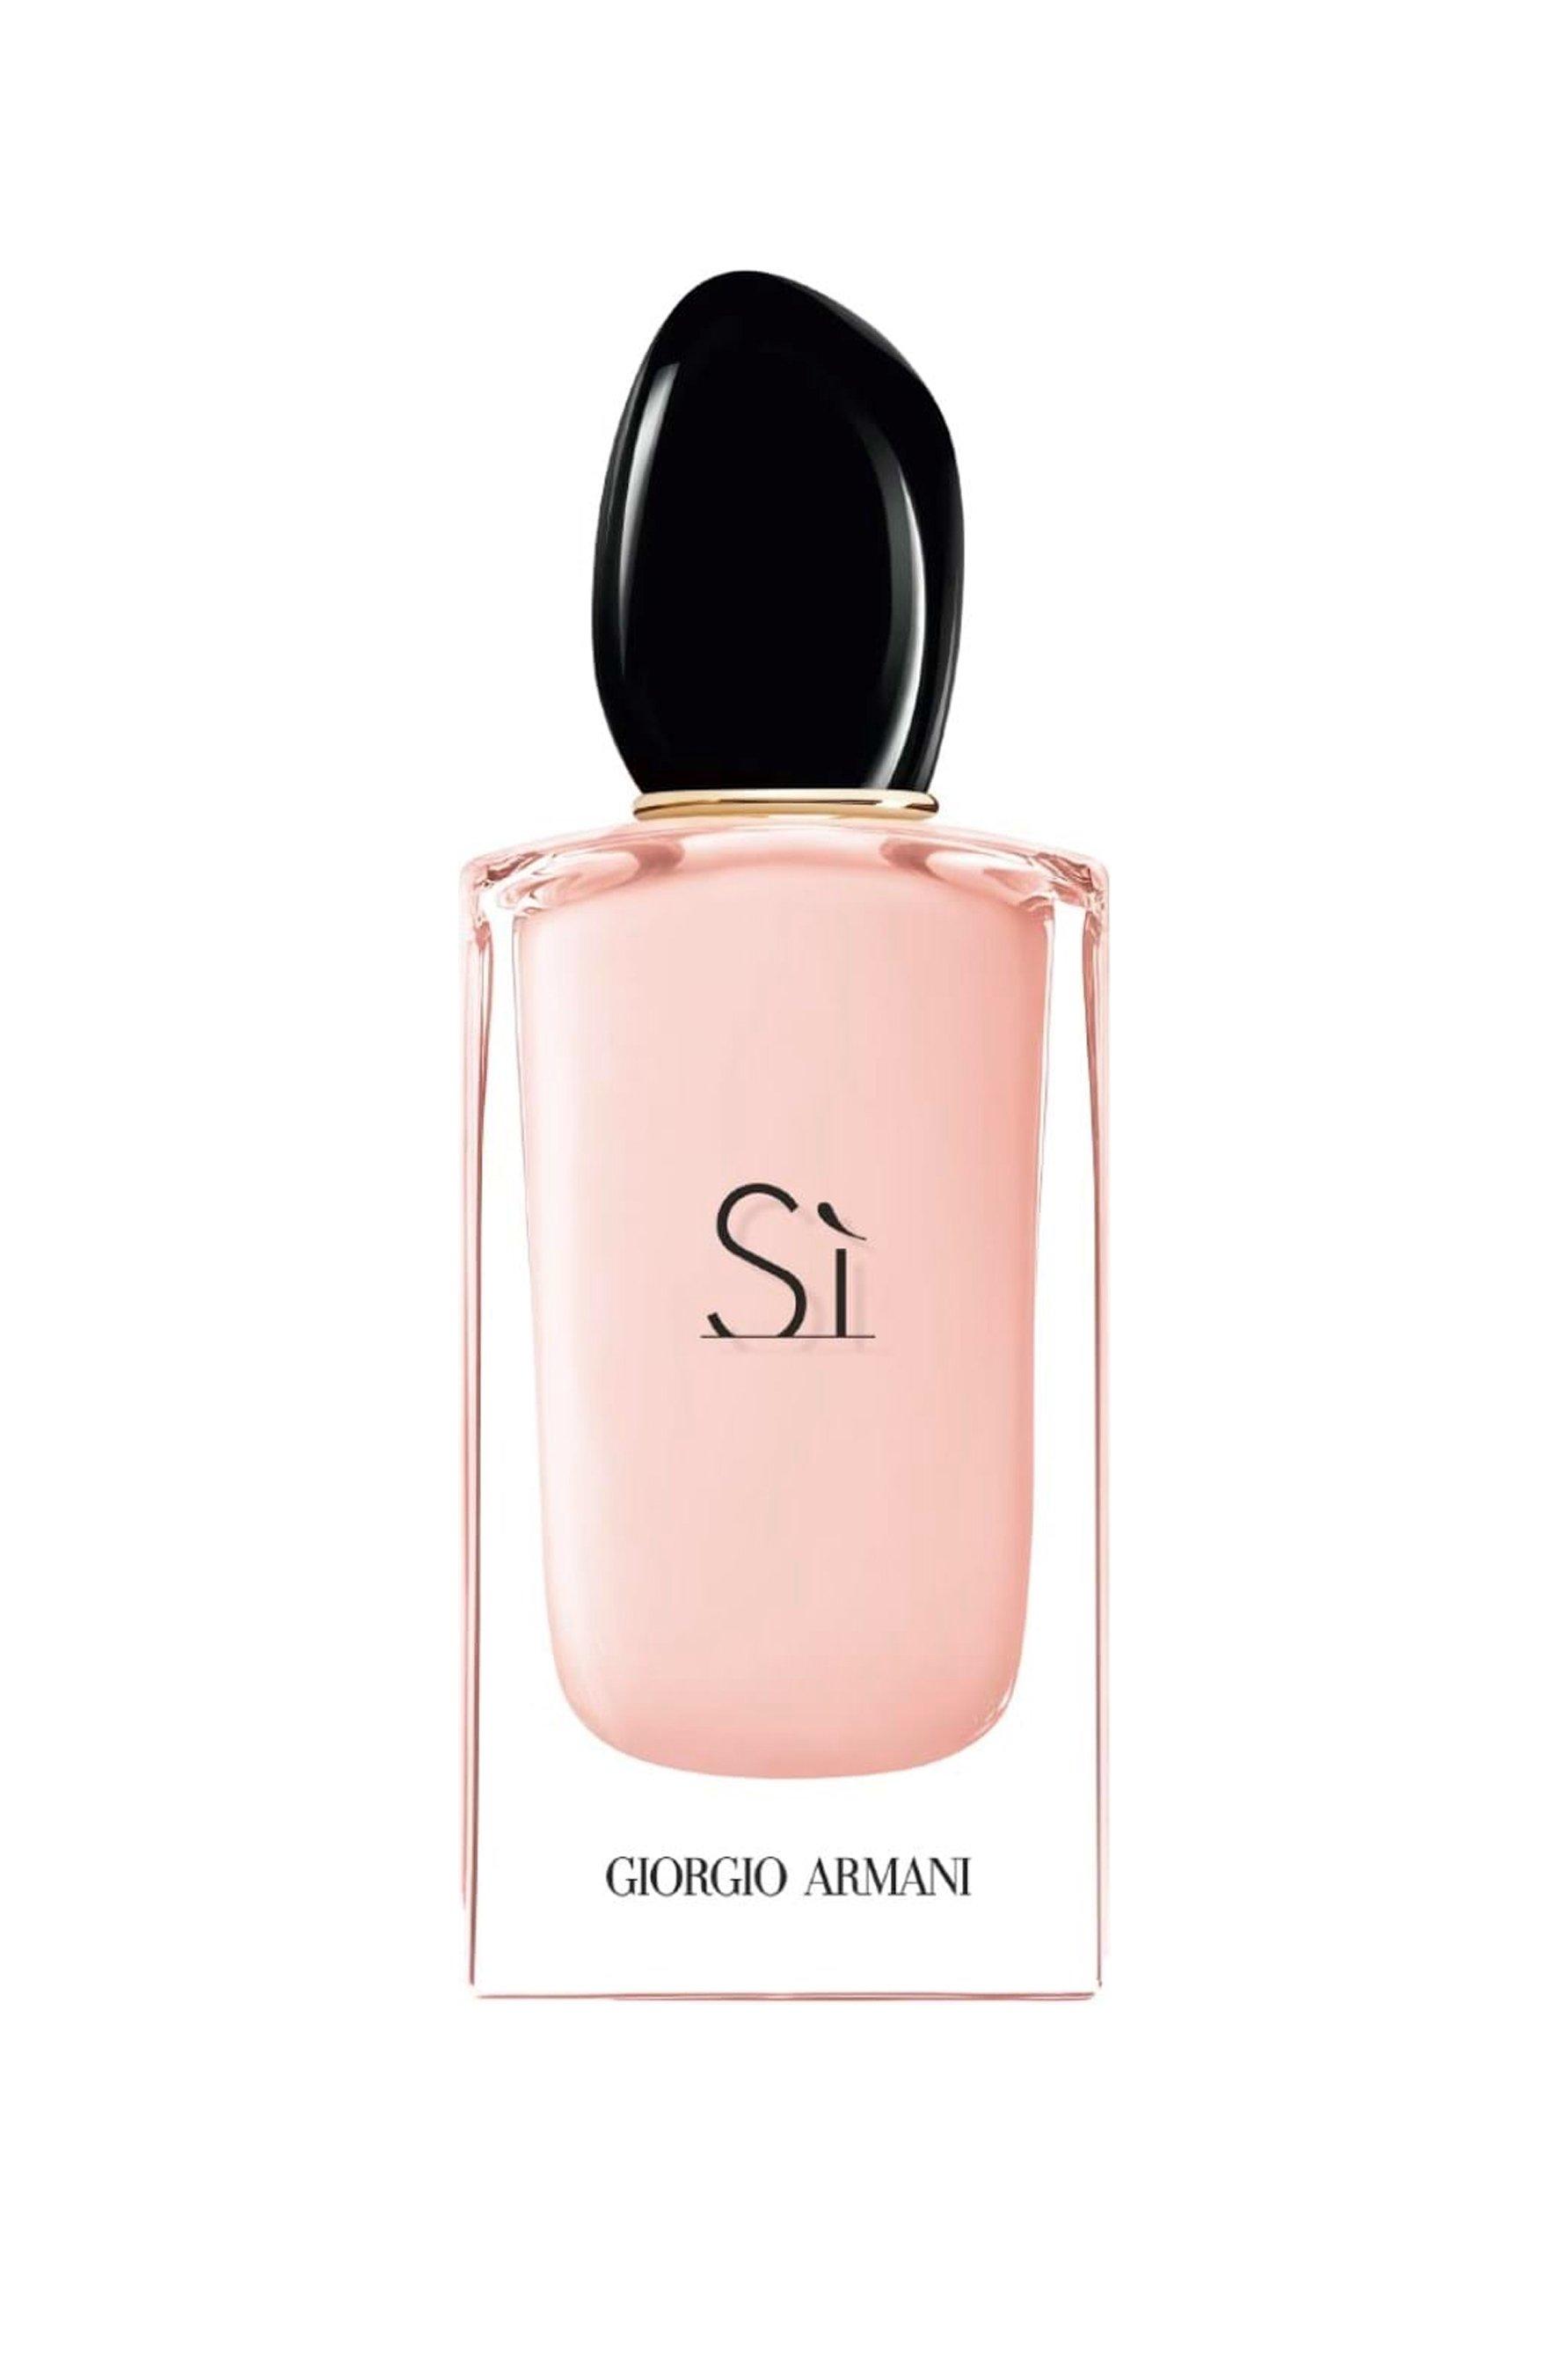 Creado por la perfumista Julie Massé, Sì Fiori reinterpreta la clásica Sì Eau de Parfum Chypre con neroli, mandarina verde, grosella negra, vainilla y almizcle blanco. (Suministrada)